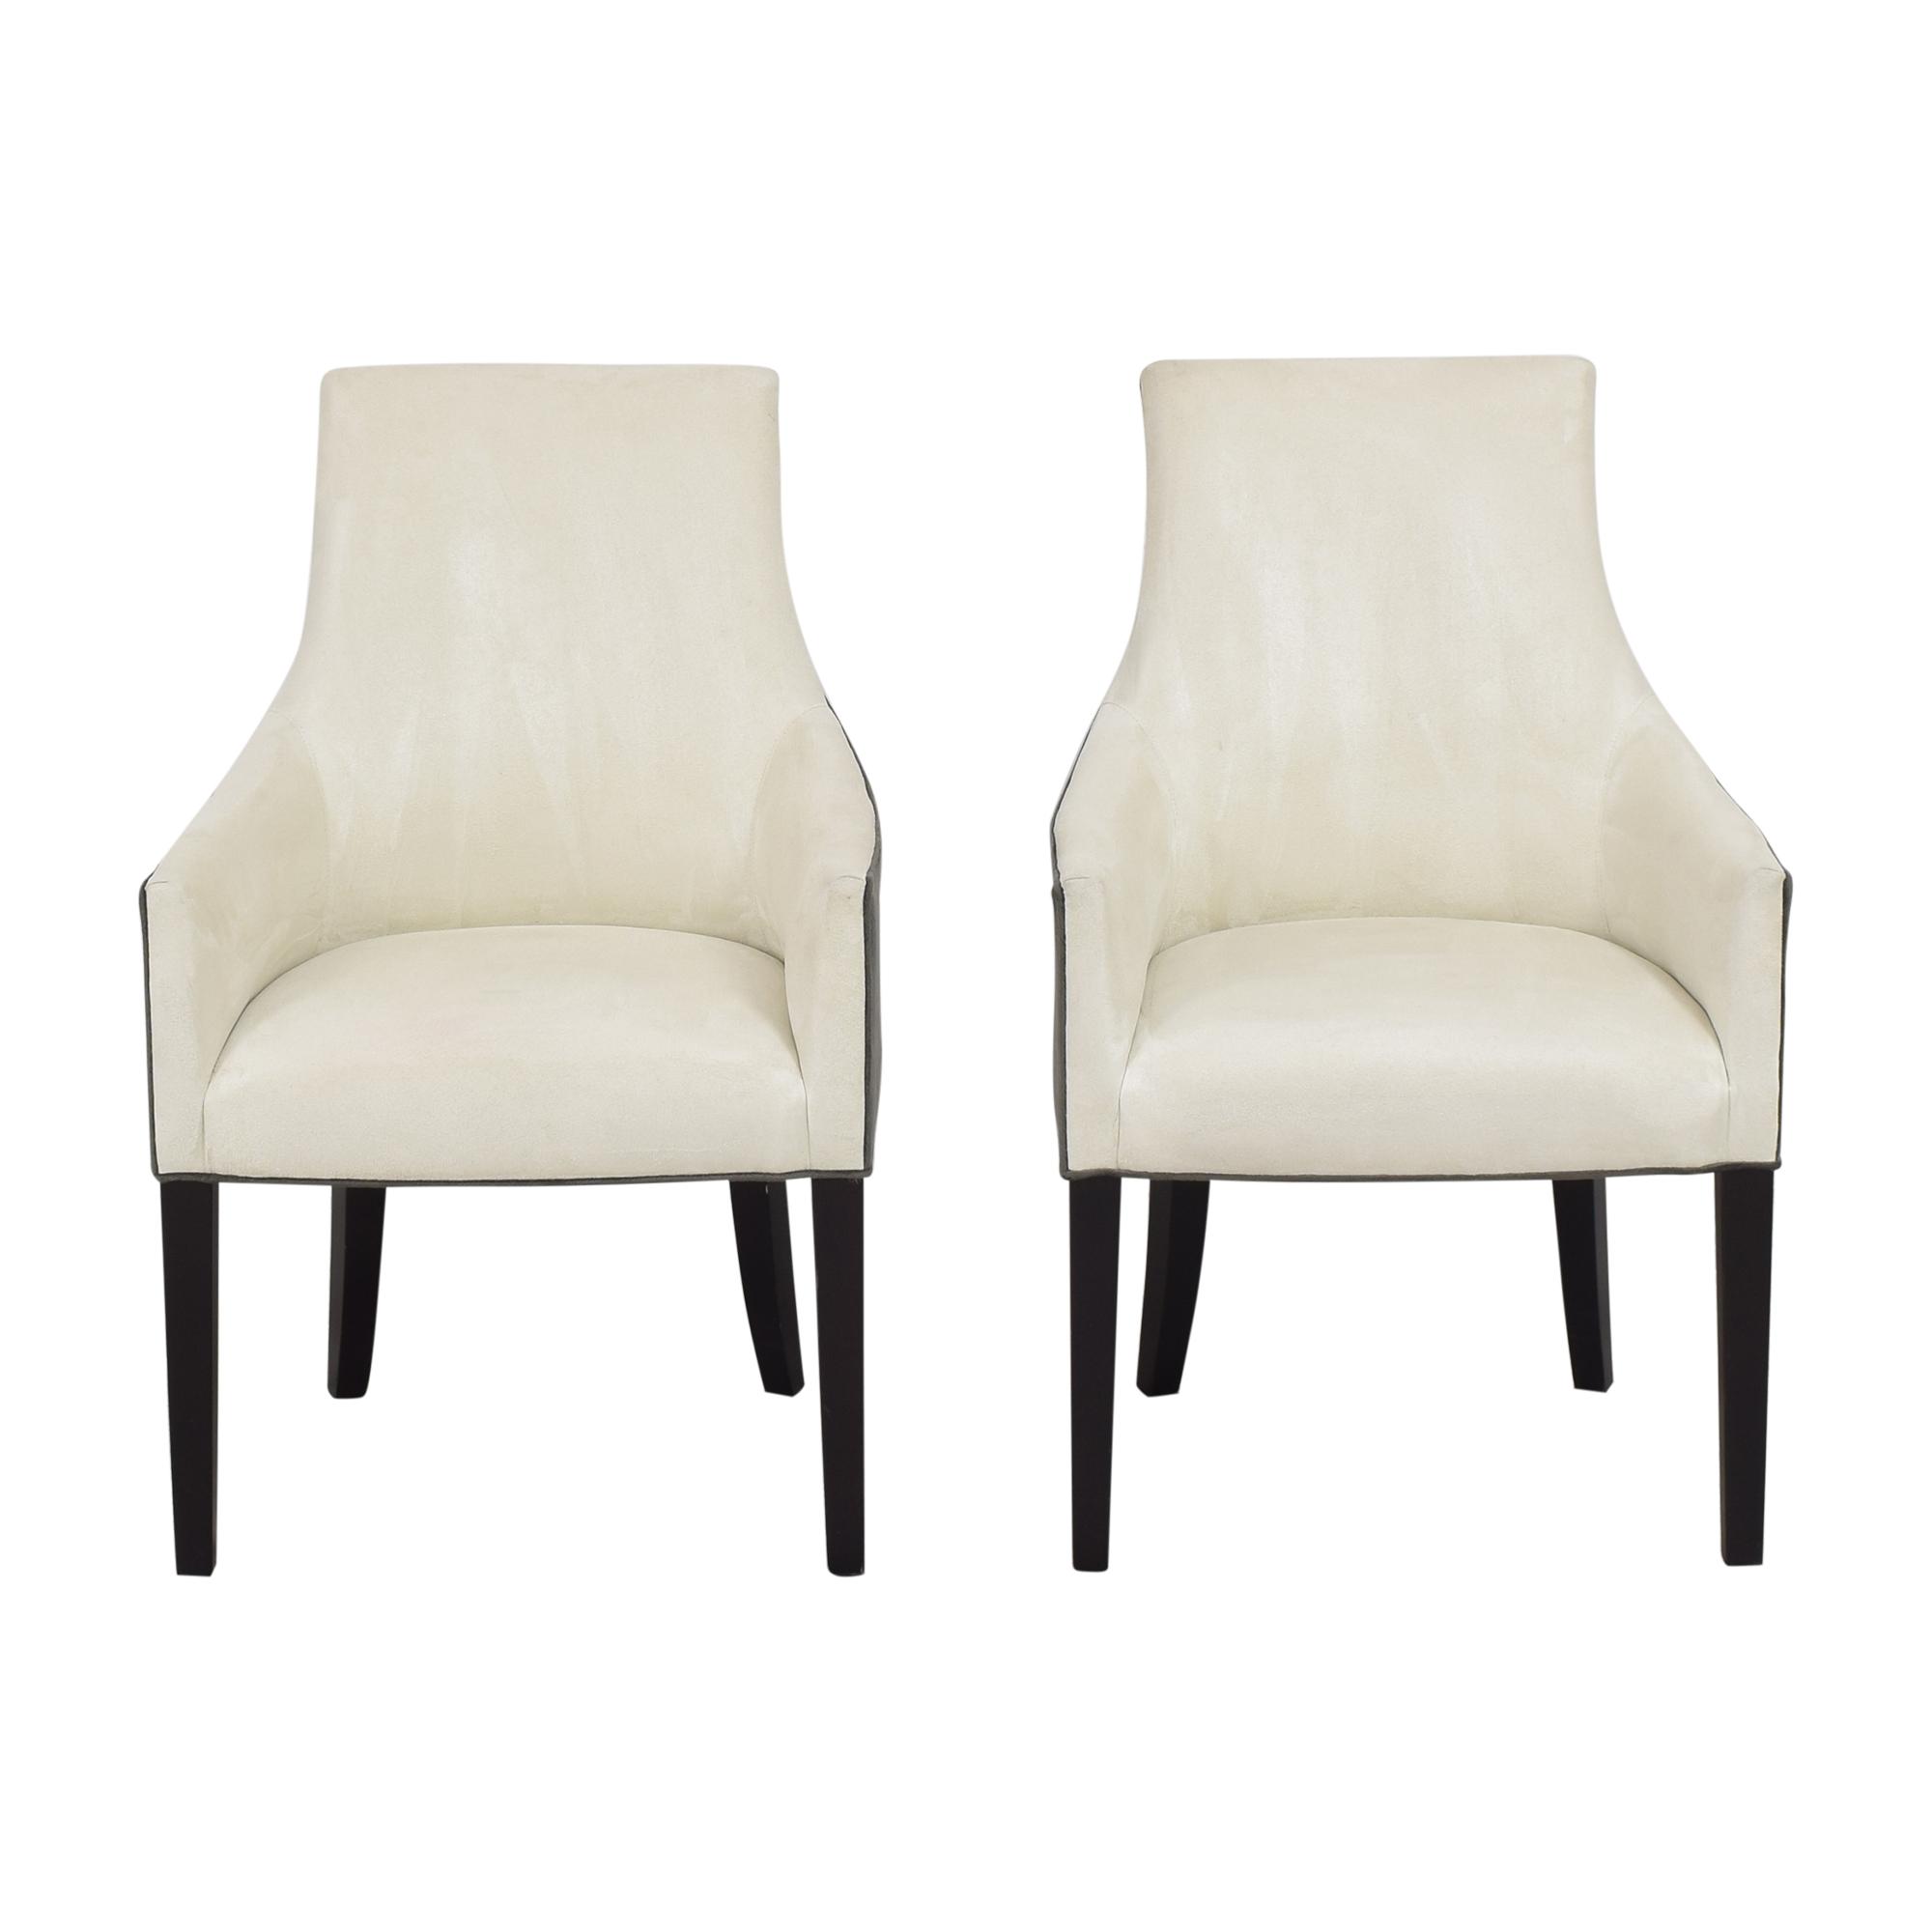 buy Mitchell Gold + Bob Williams Ada Dining Arm Chairs Mitchell Gold + Bob Williams Chairs